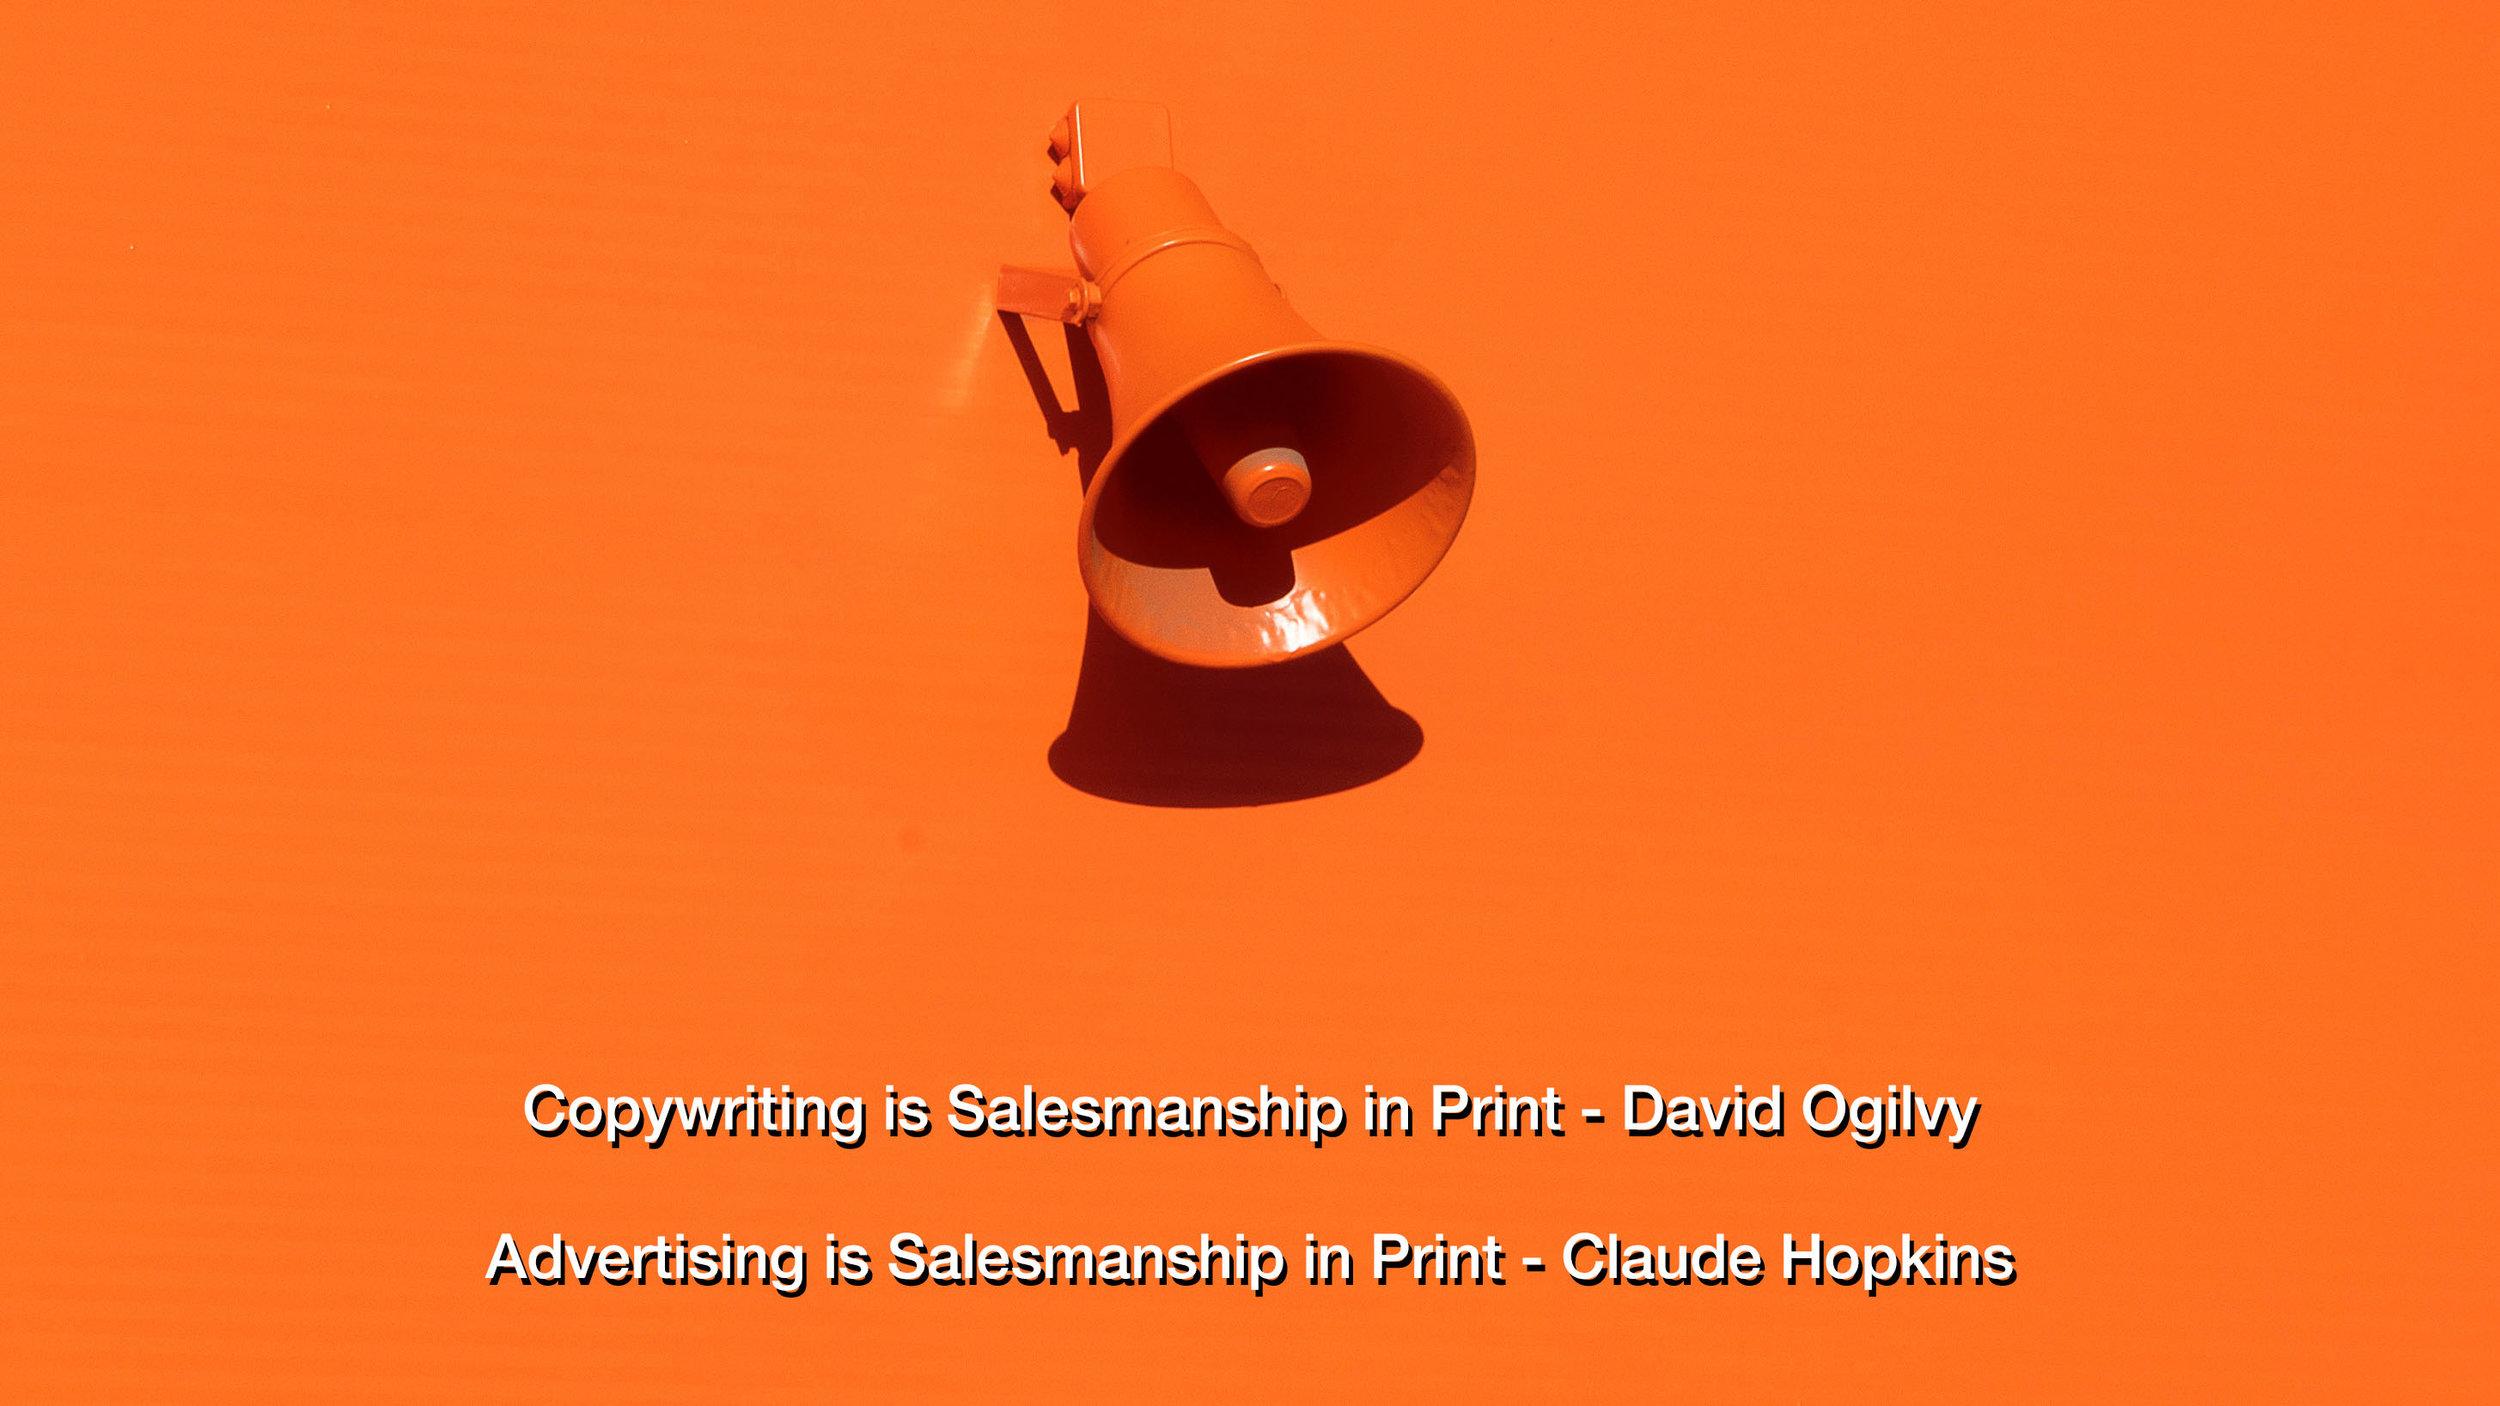 Digital Copywriting-oleg-laptev-546607-unsplash Edited with Text & DownSampled.jpg